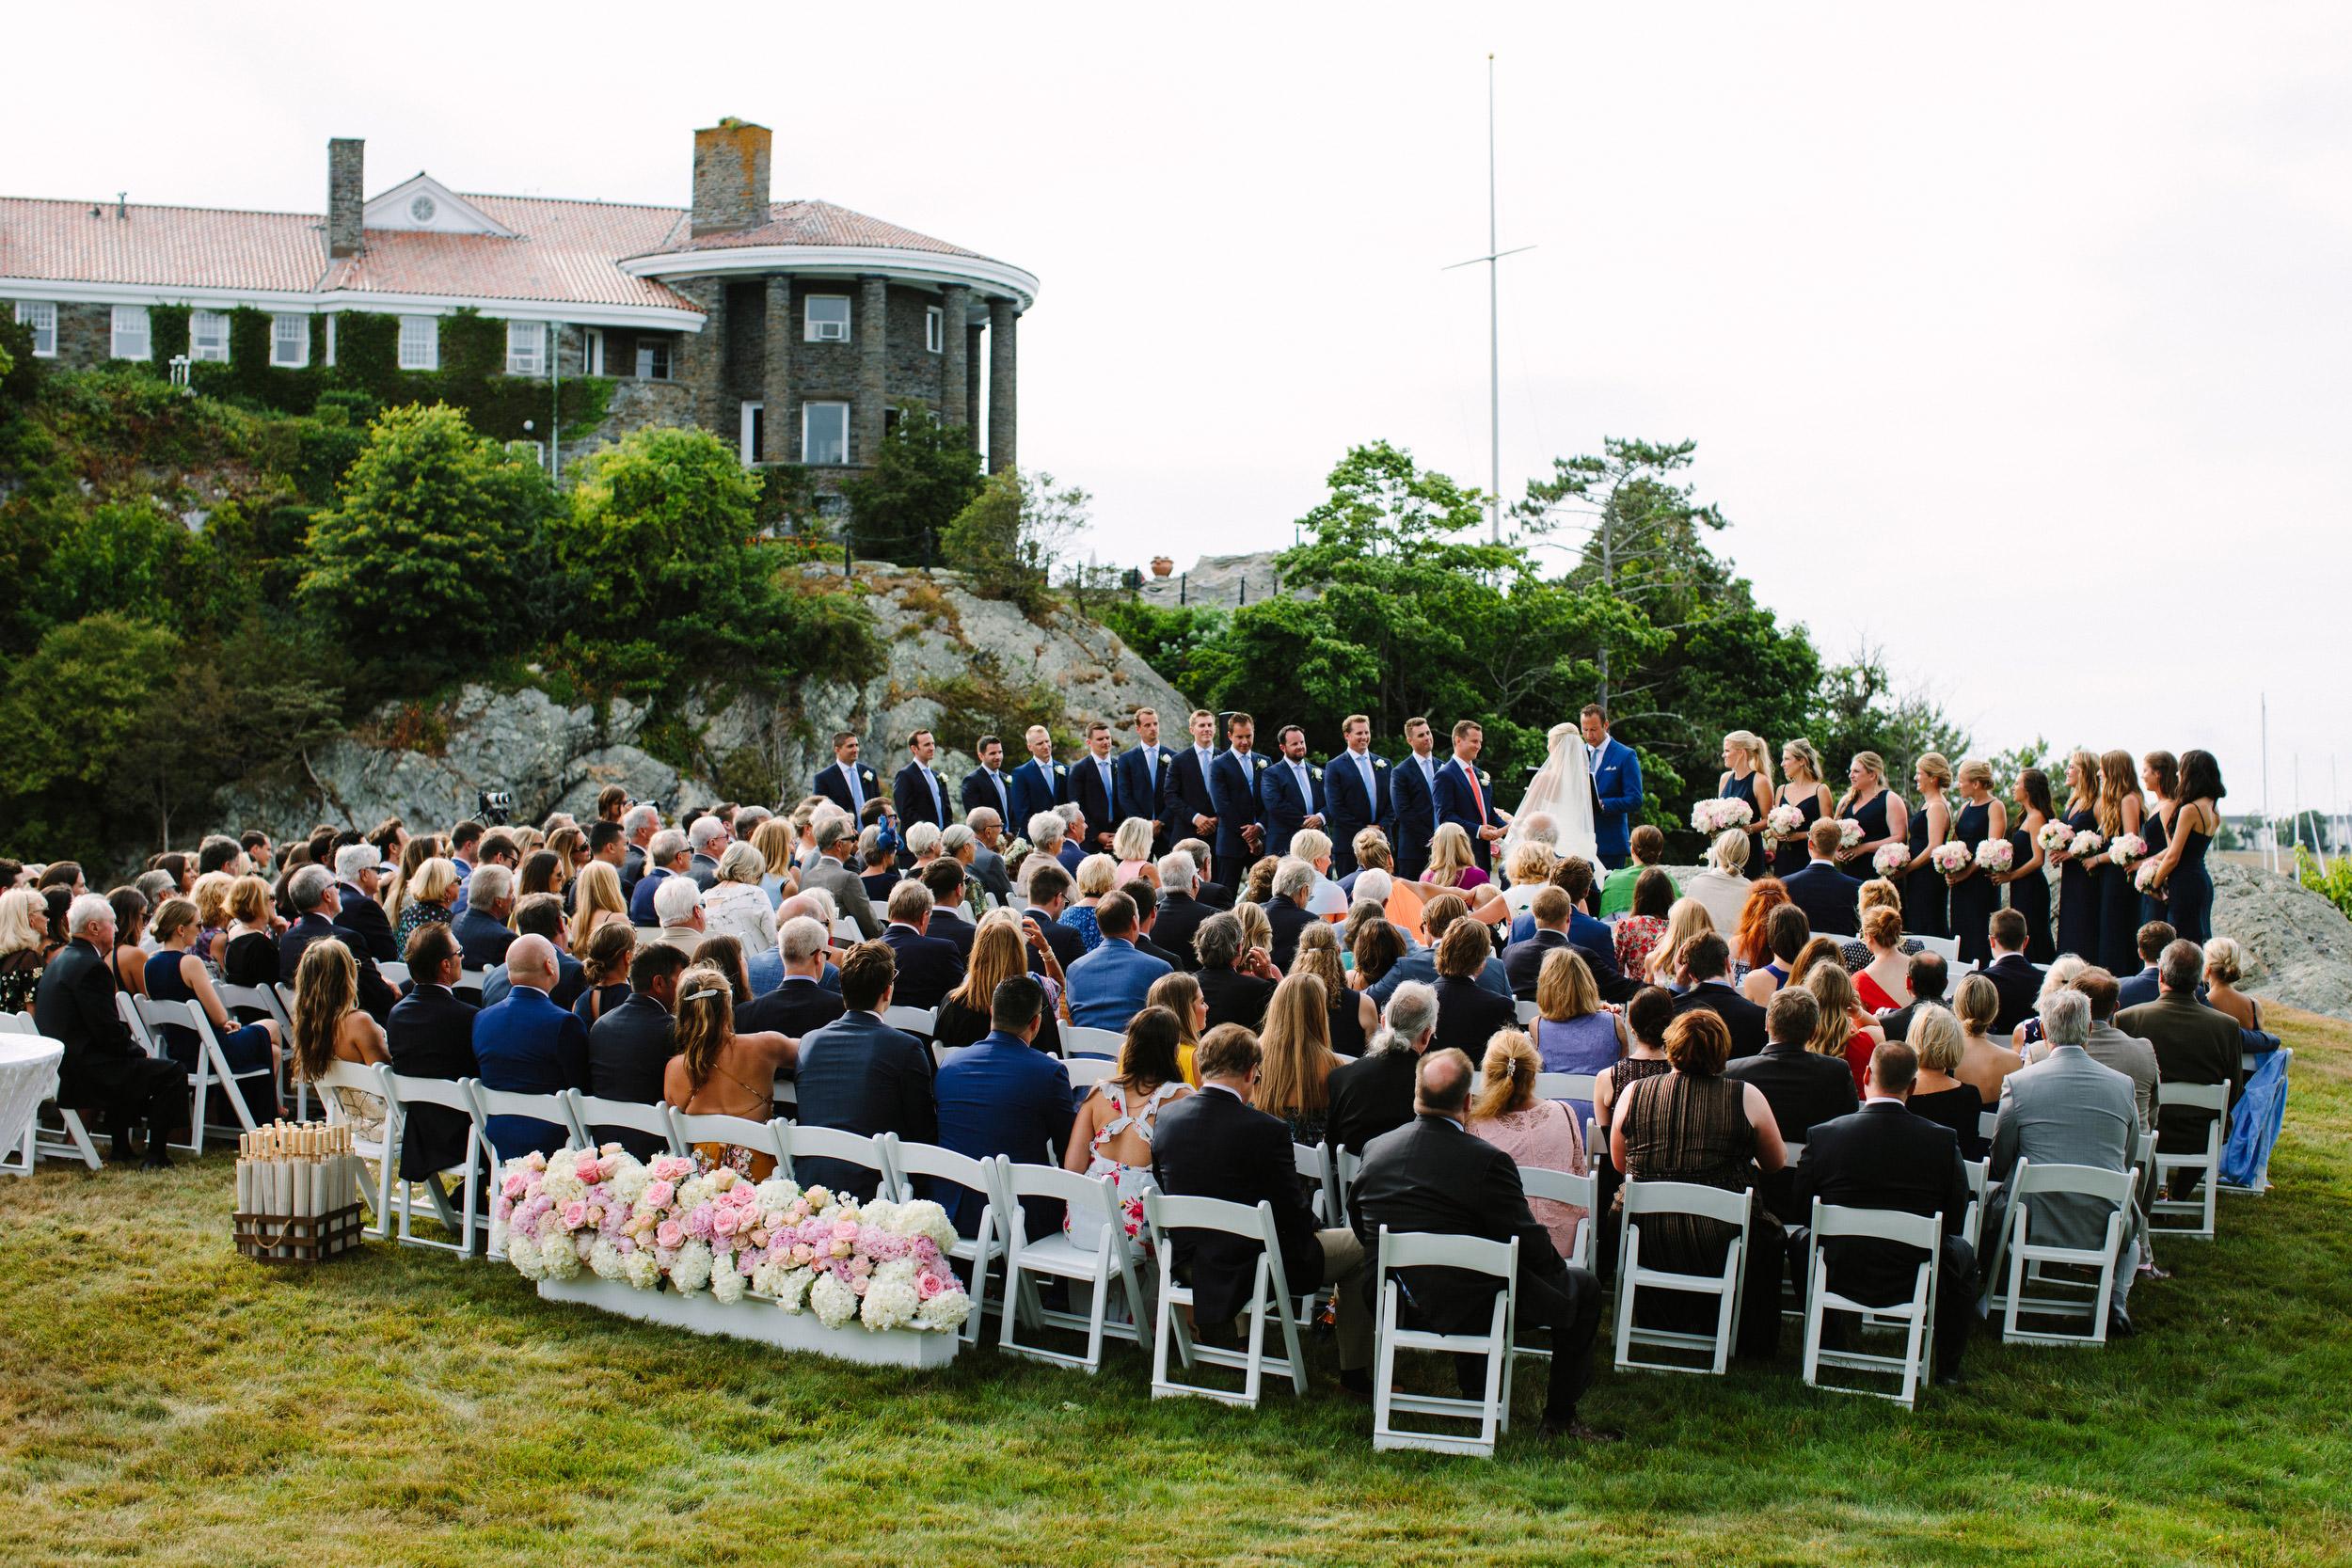 newport_rhode_island_wedding_048.jpg